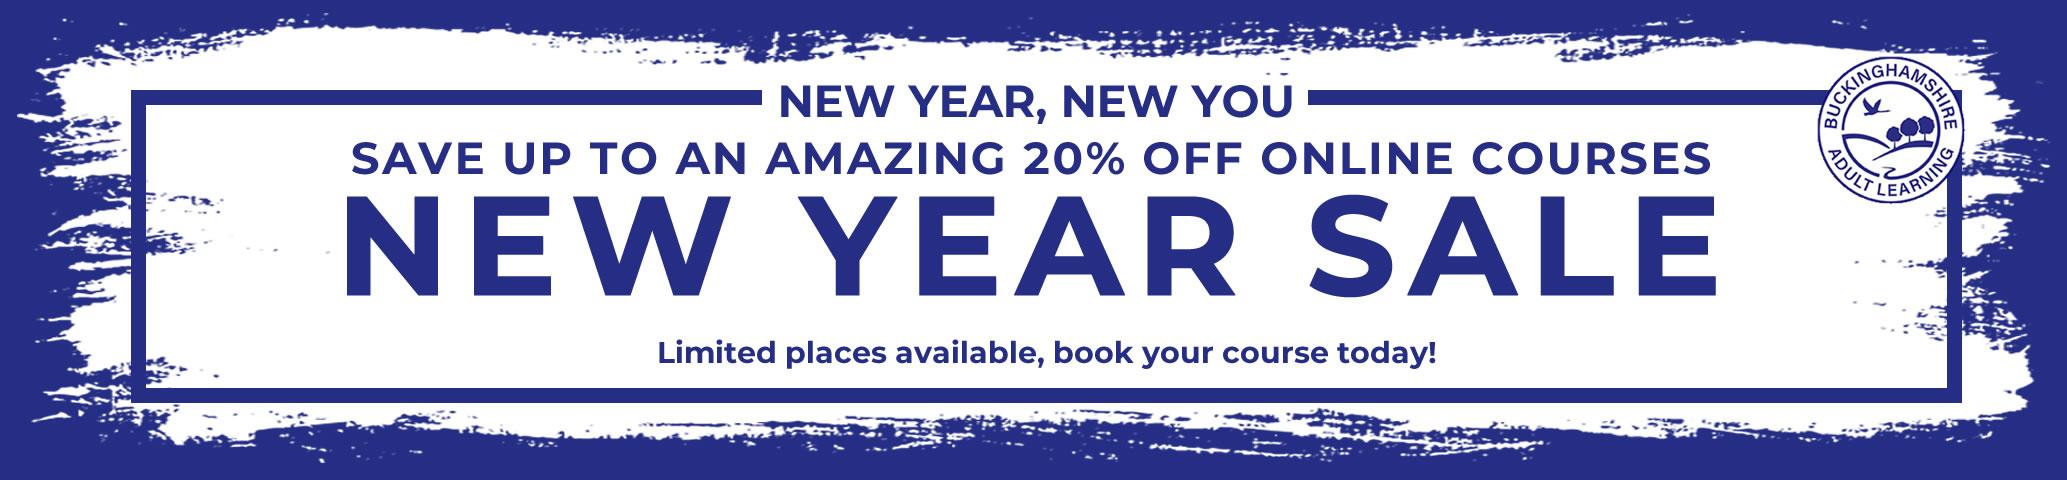 New-Year-Sale-Online